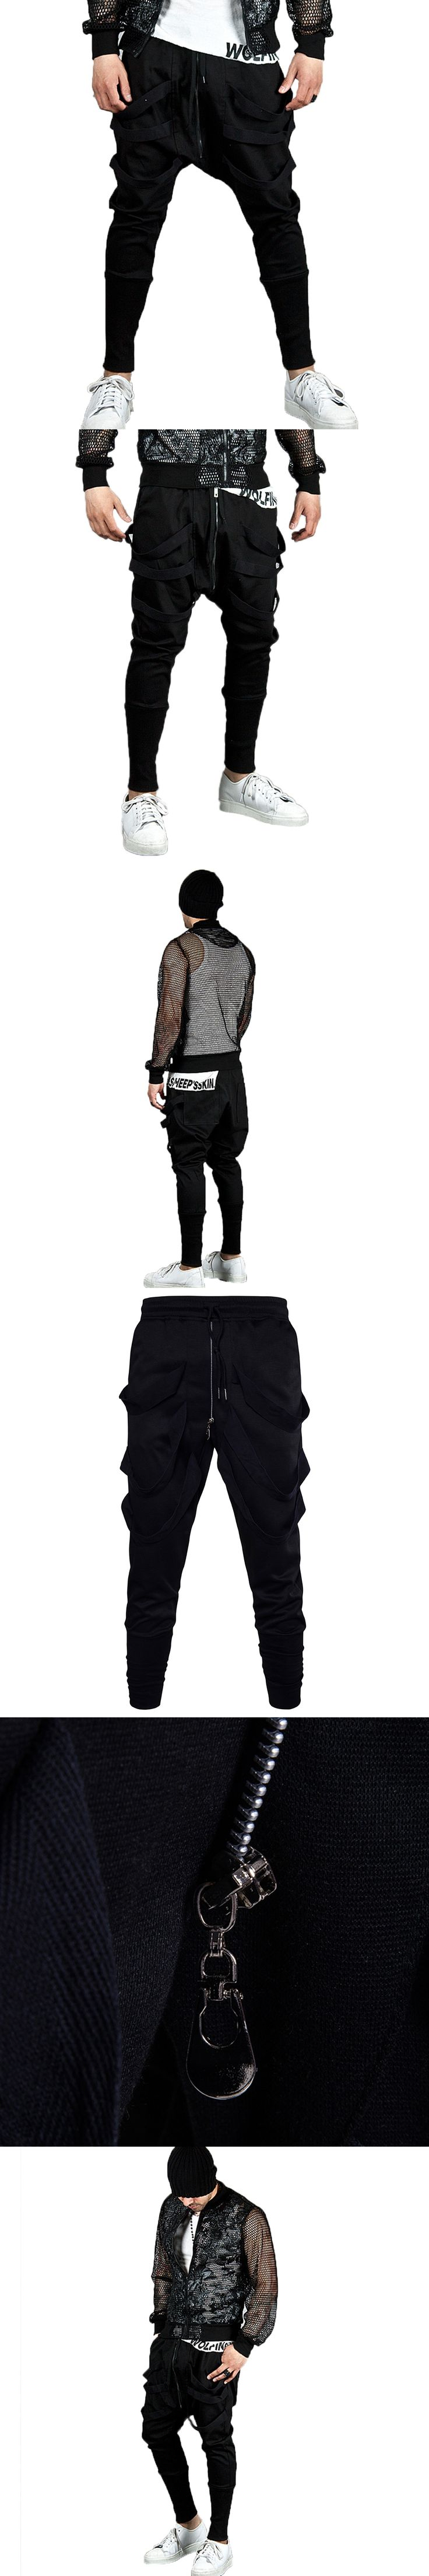 Black Personality Zipper Designer Mens Sweatpants Low Crotch Harem Pants Loose Casual Hip Hop Streetwear Drawstring Man Trousers